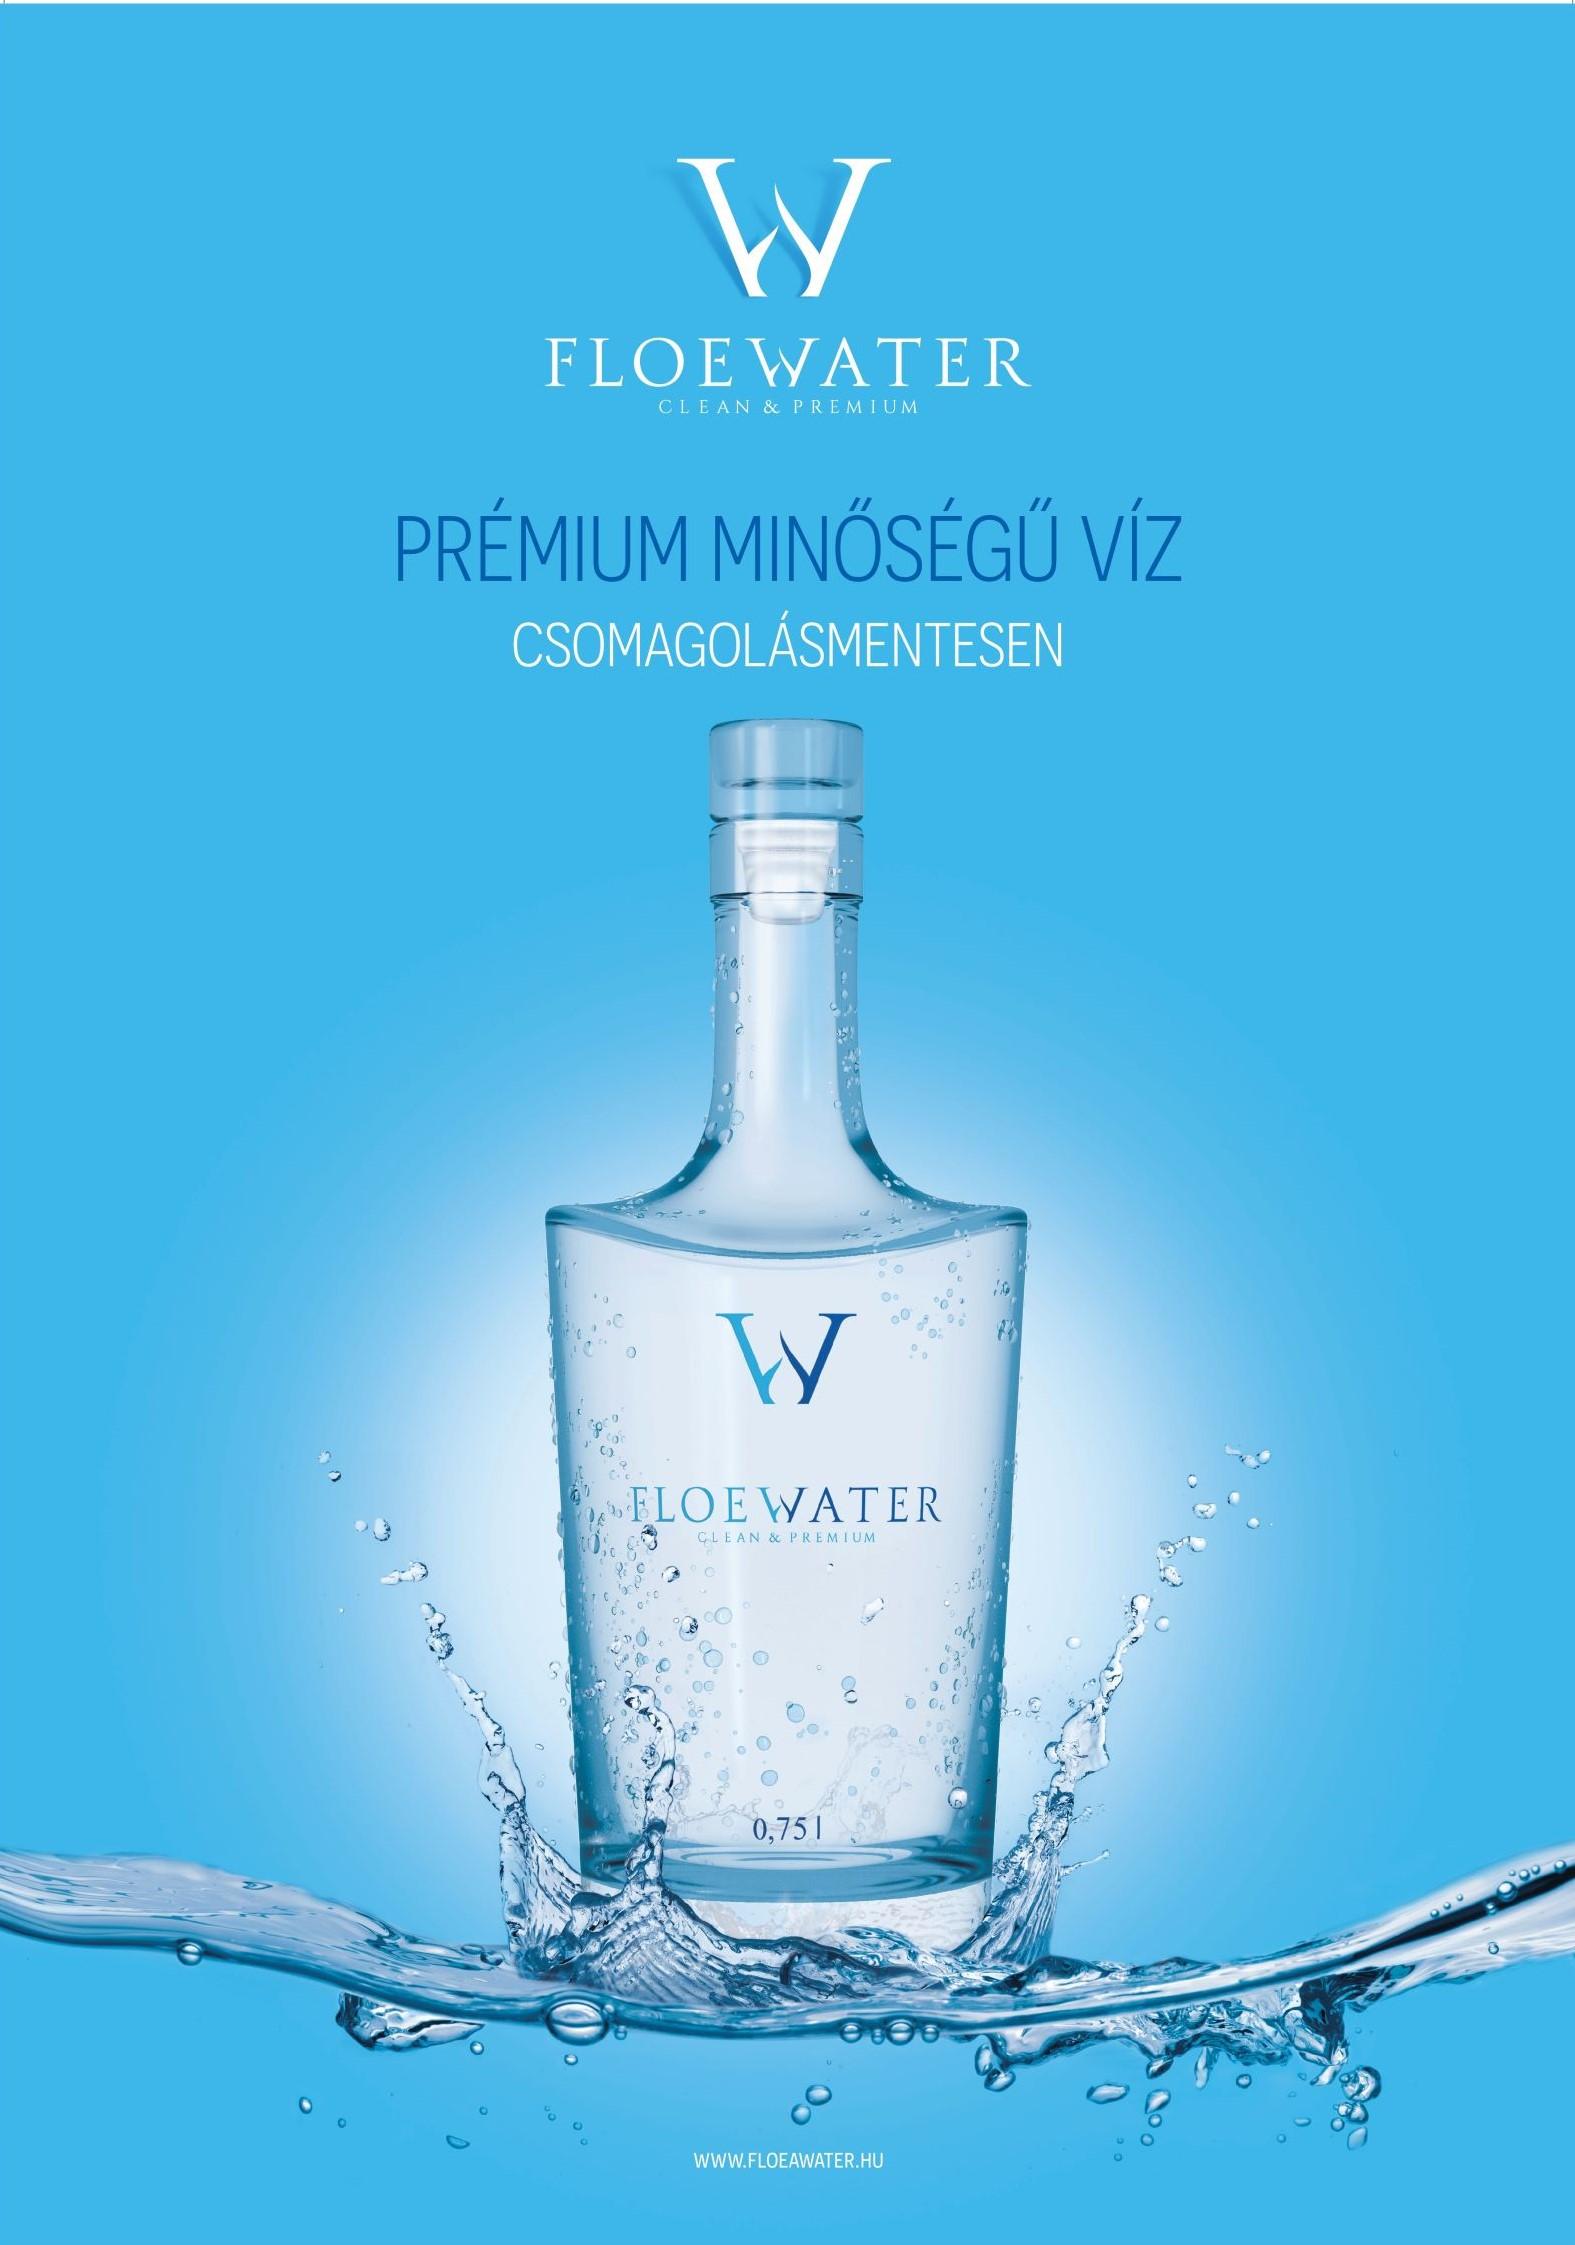 floewater